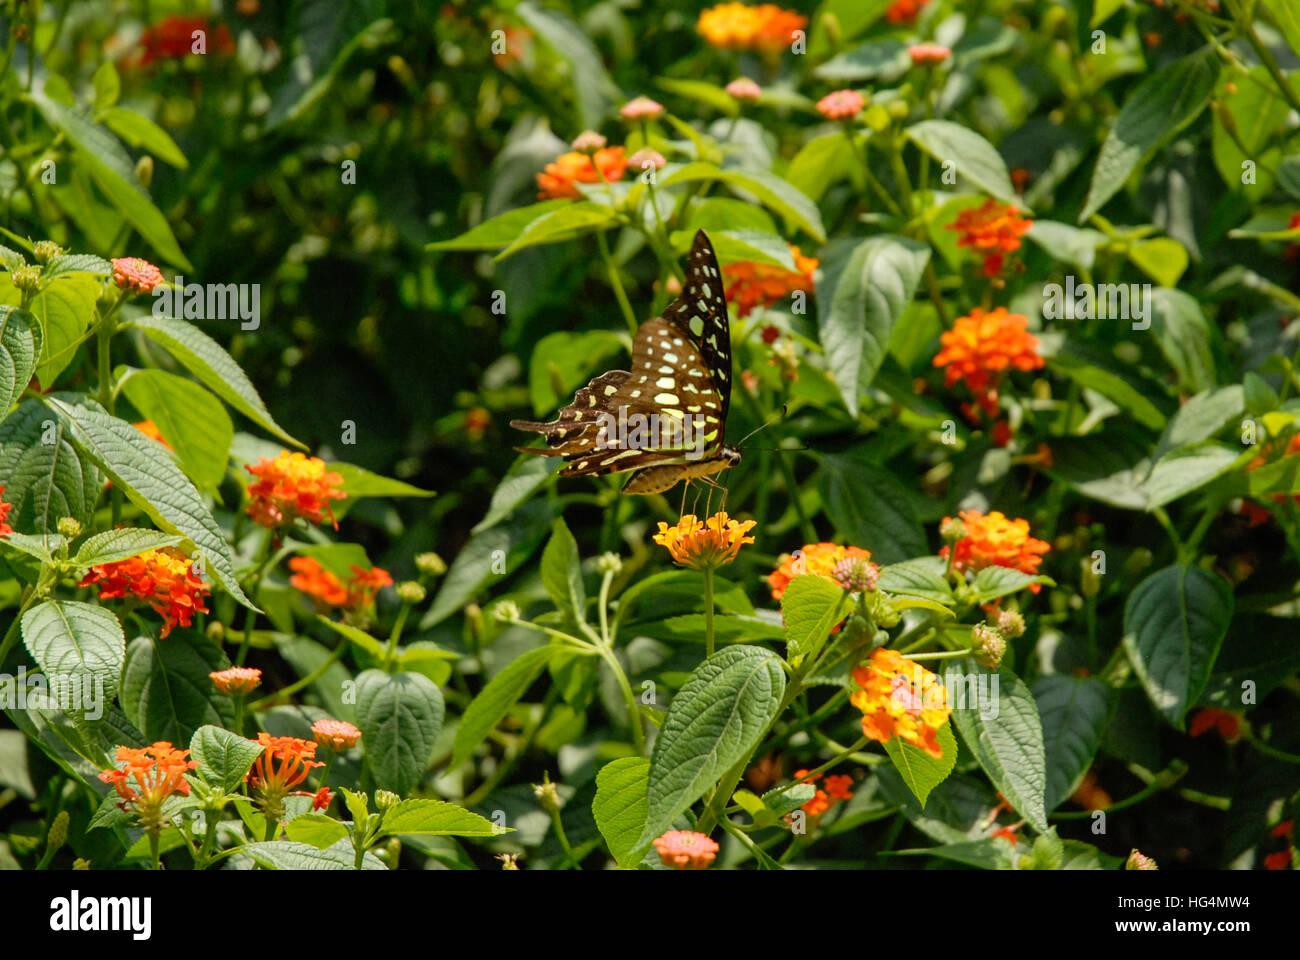 Swallowtail Butterfly in Vietnam - Stock Image